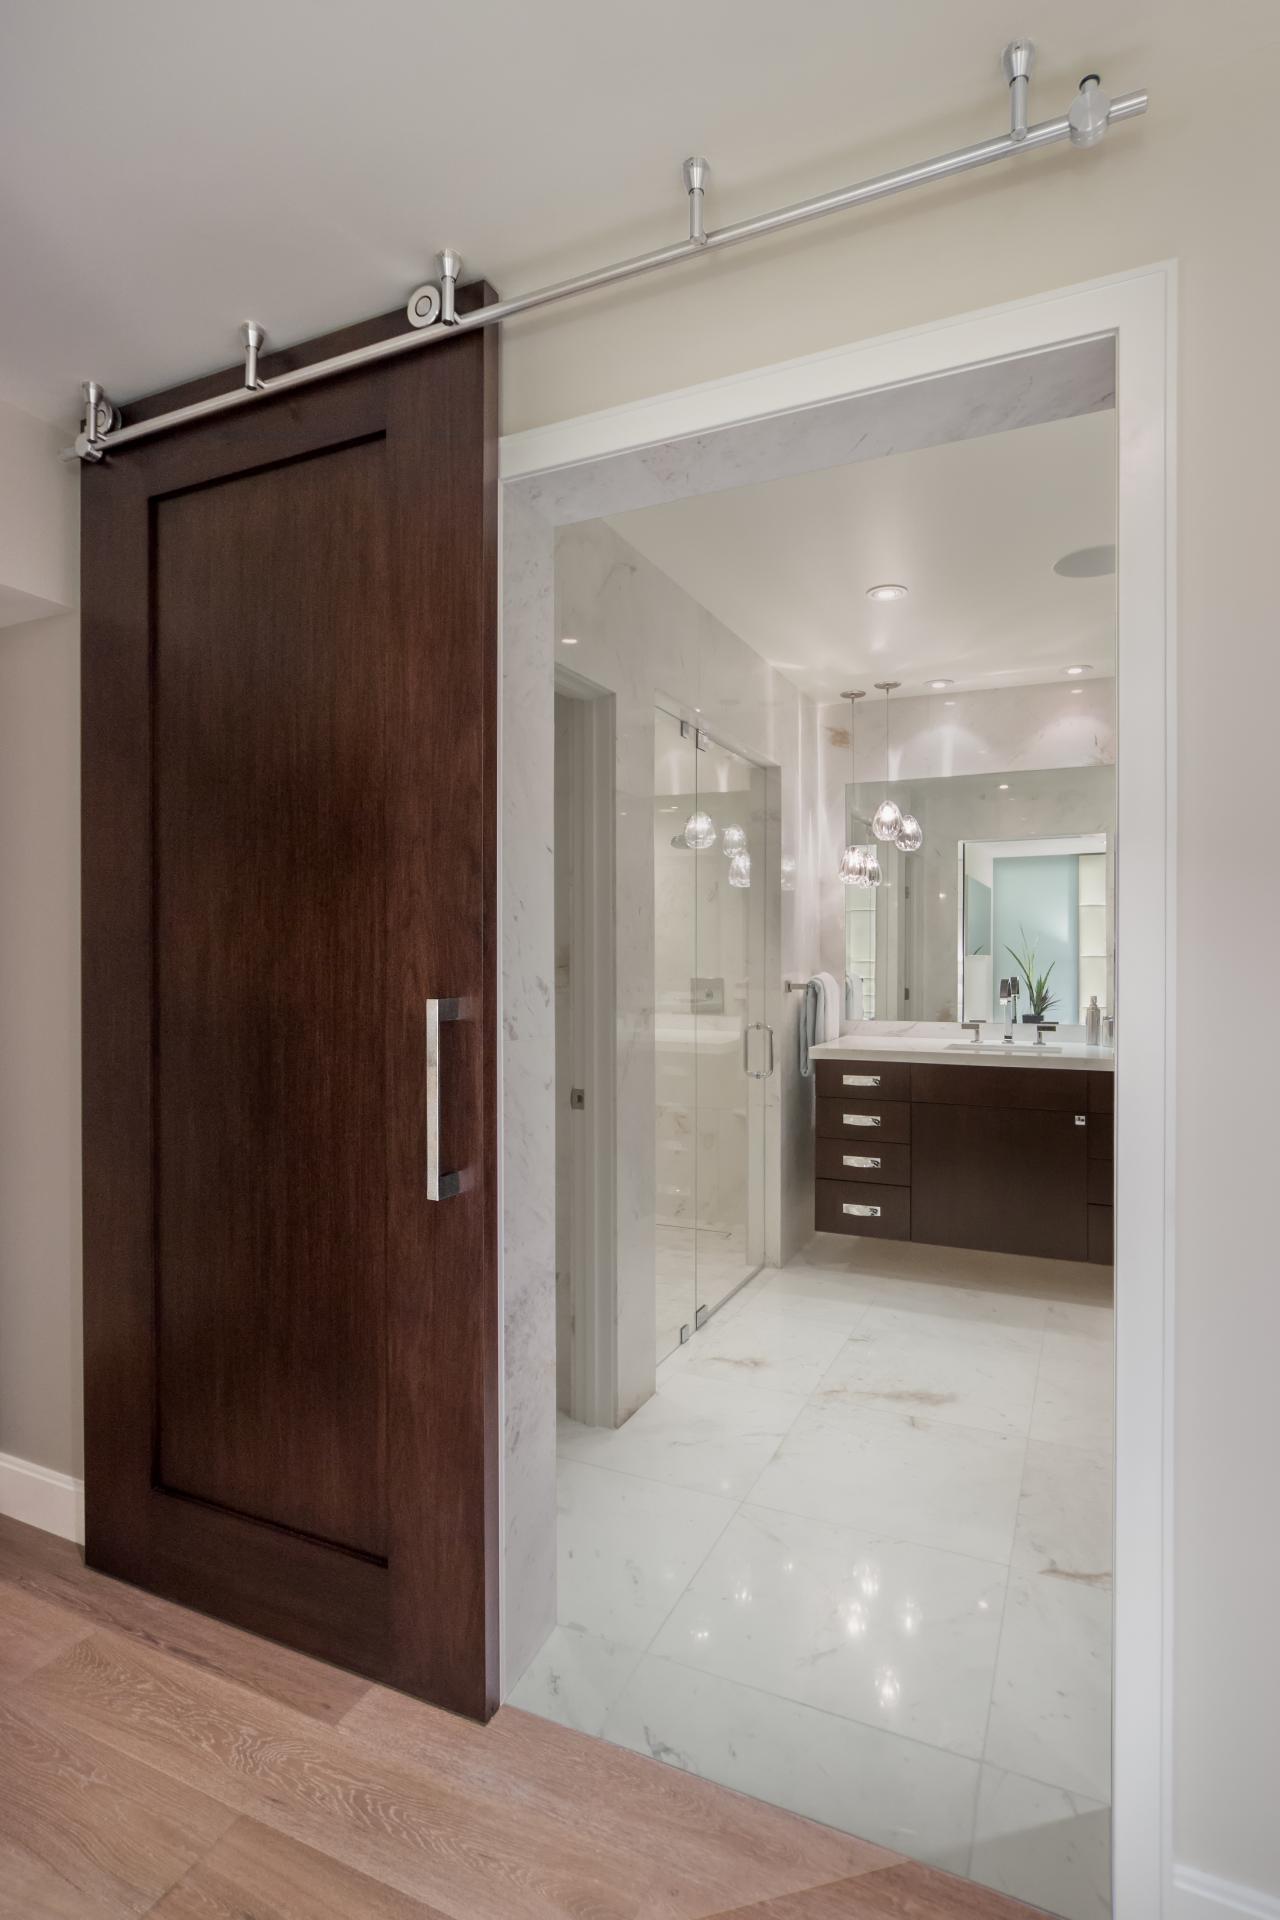 Sliding Barn Style Door Bathroom Pic